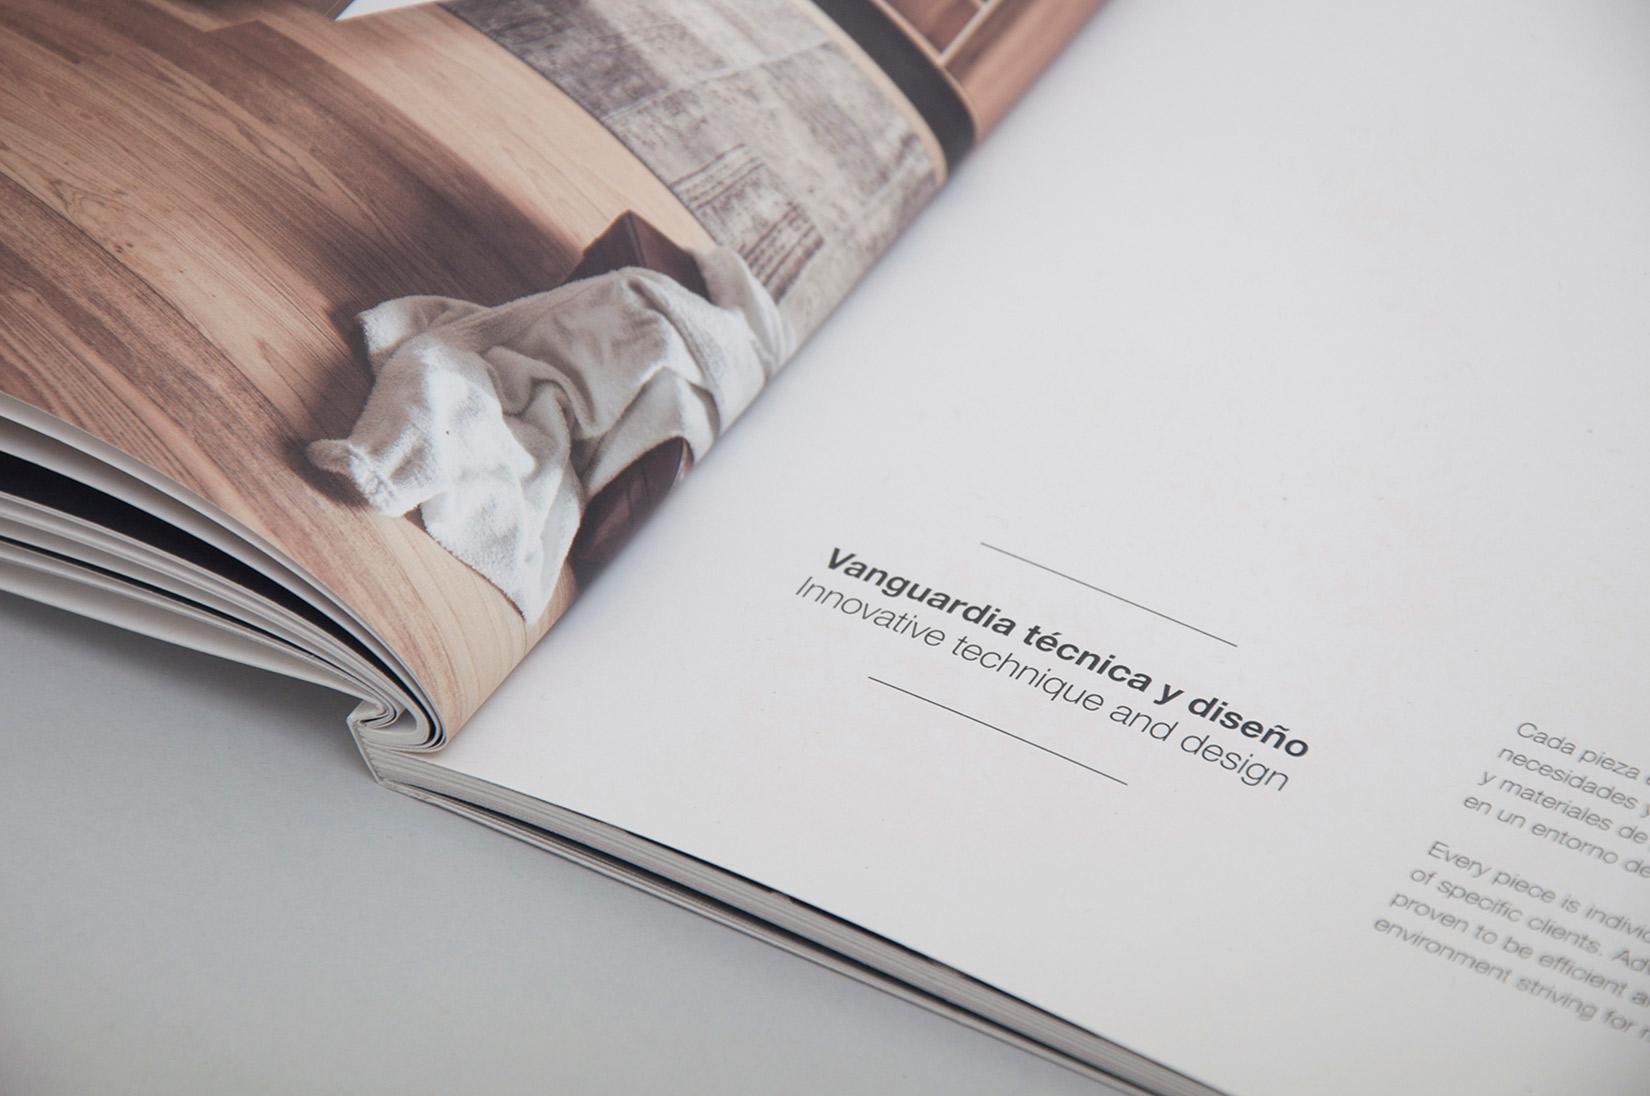 Espacio Home Design Group. Catálogo Y Web.